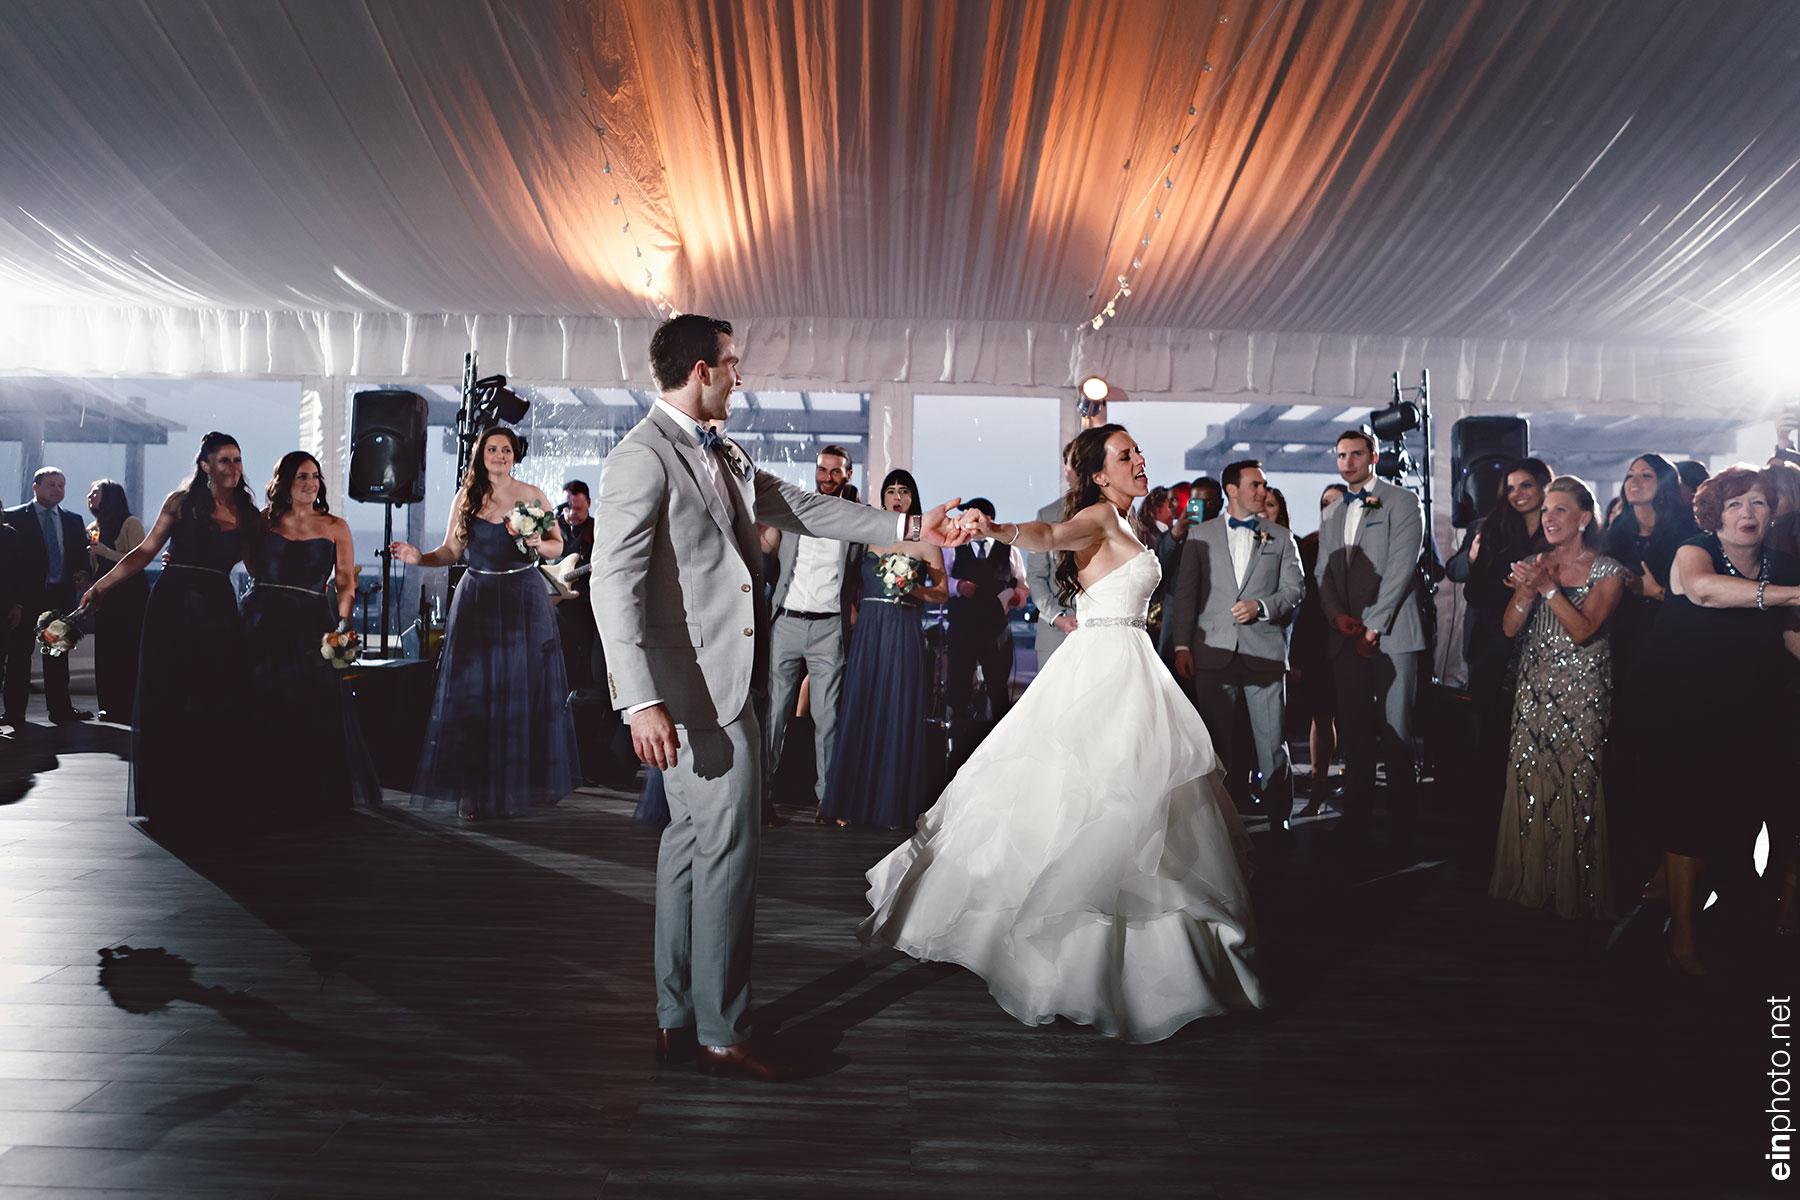 gurneys-montauk-wedding-0043.jpg